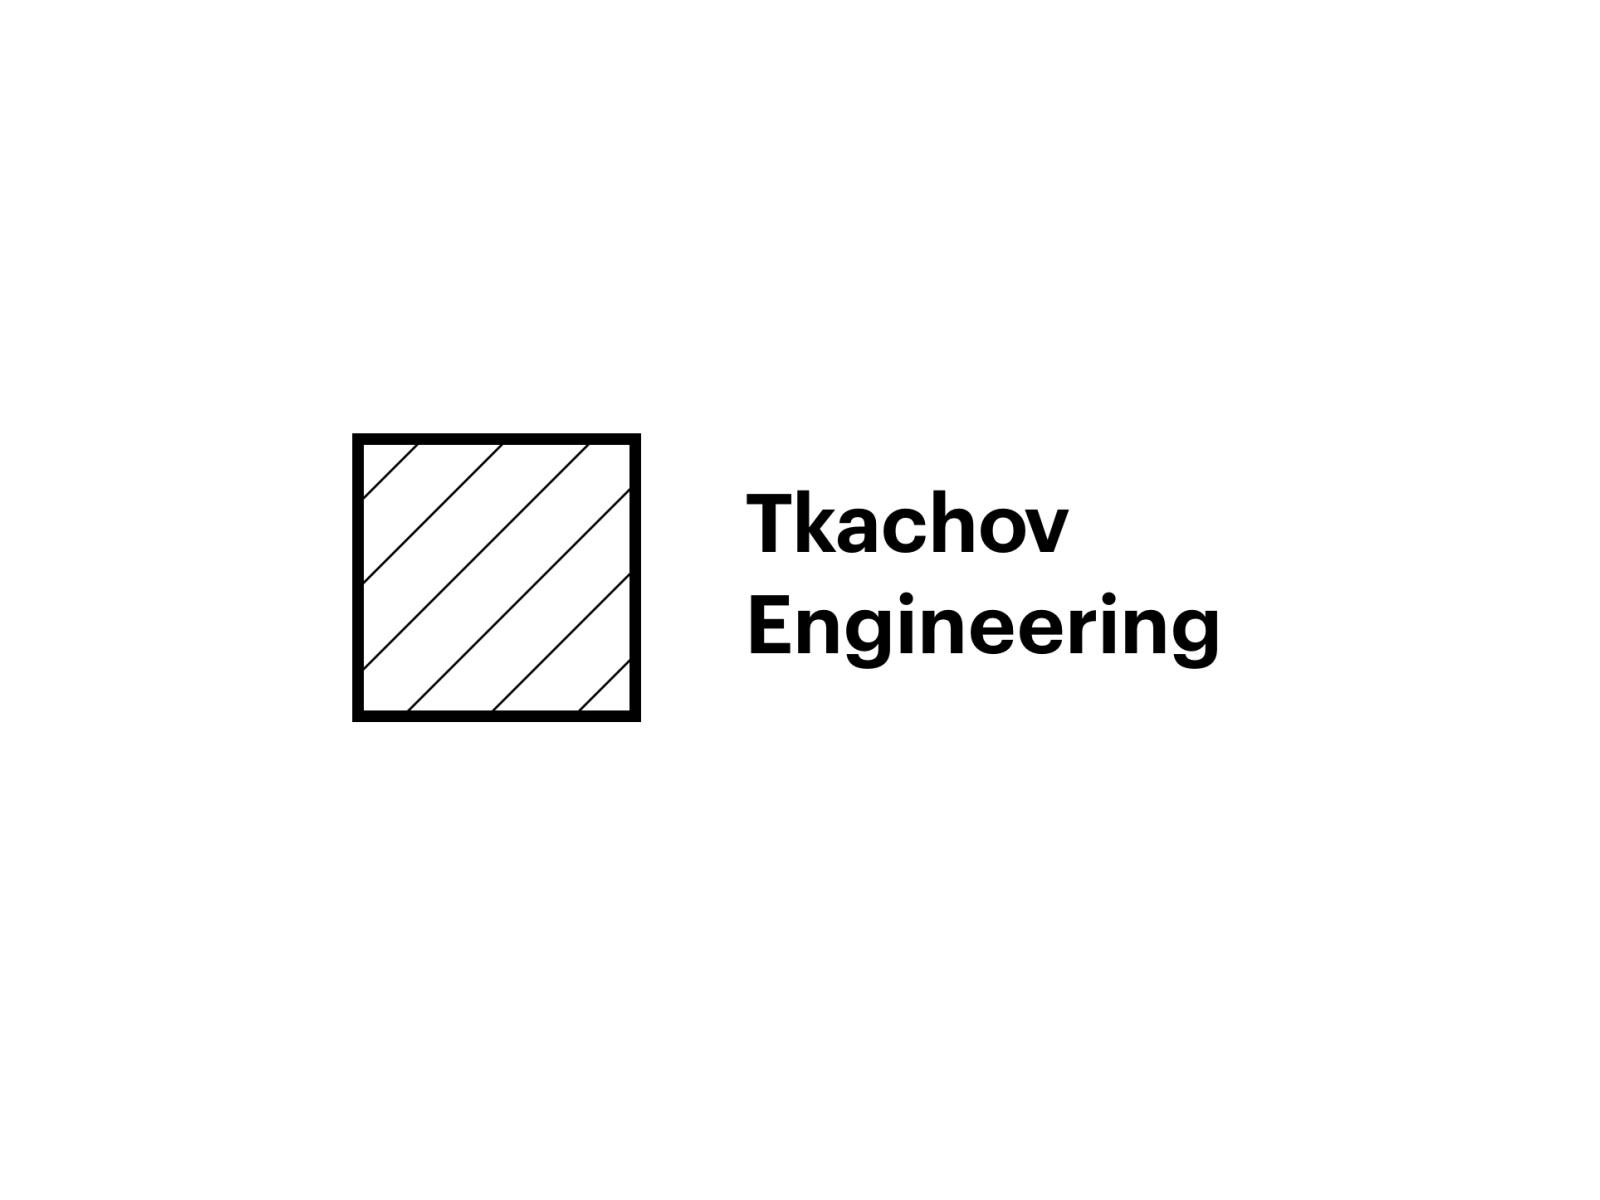 Tkachov engineering logo concepts 1 0 by basov design